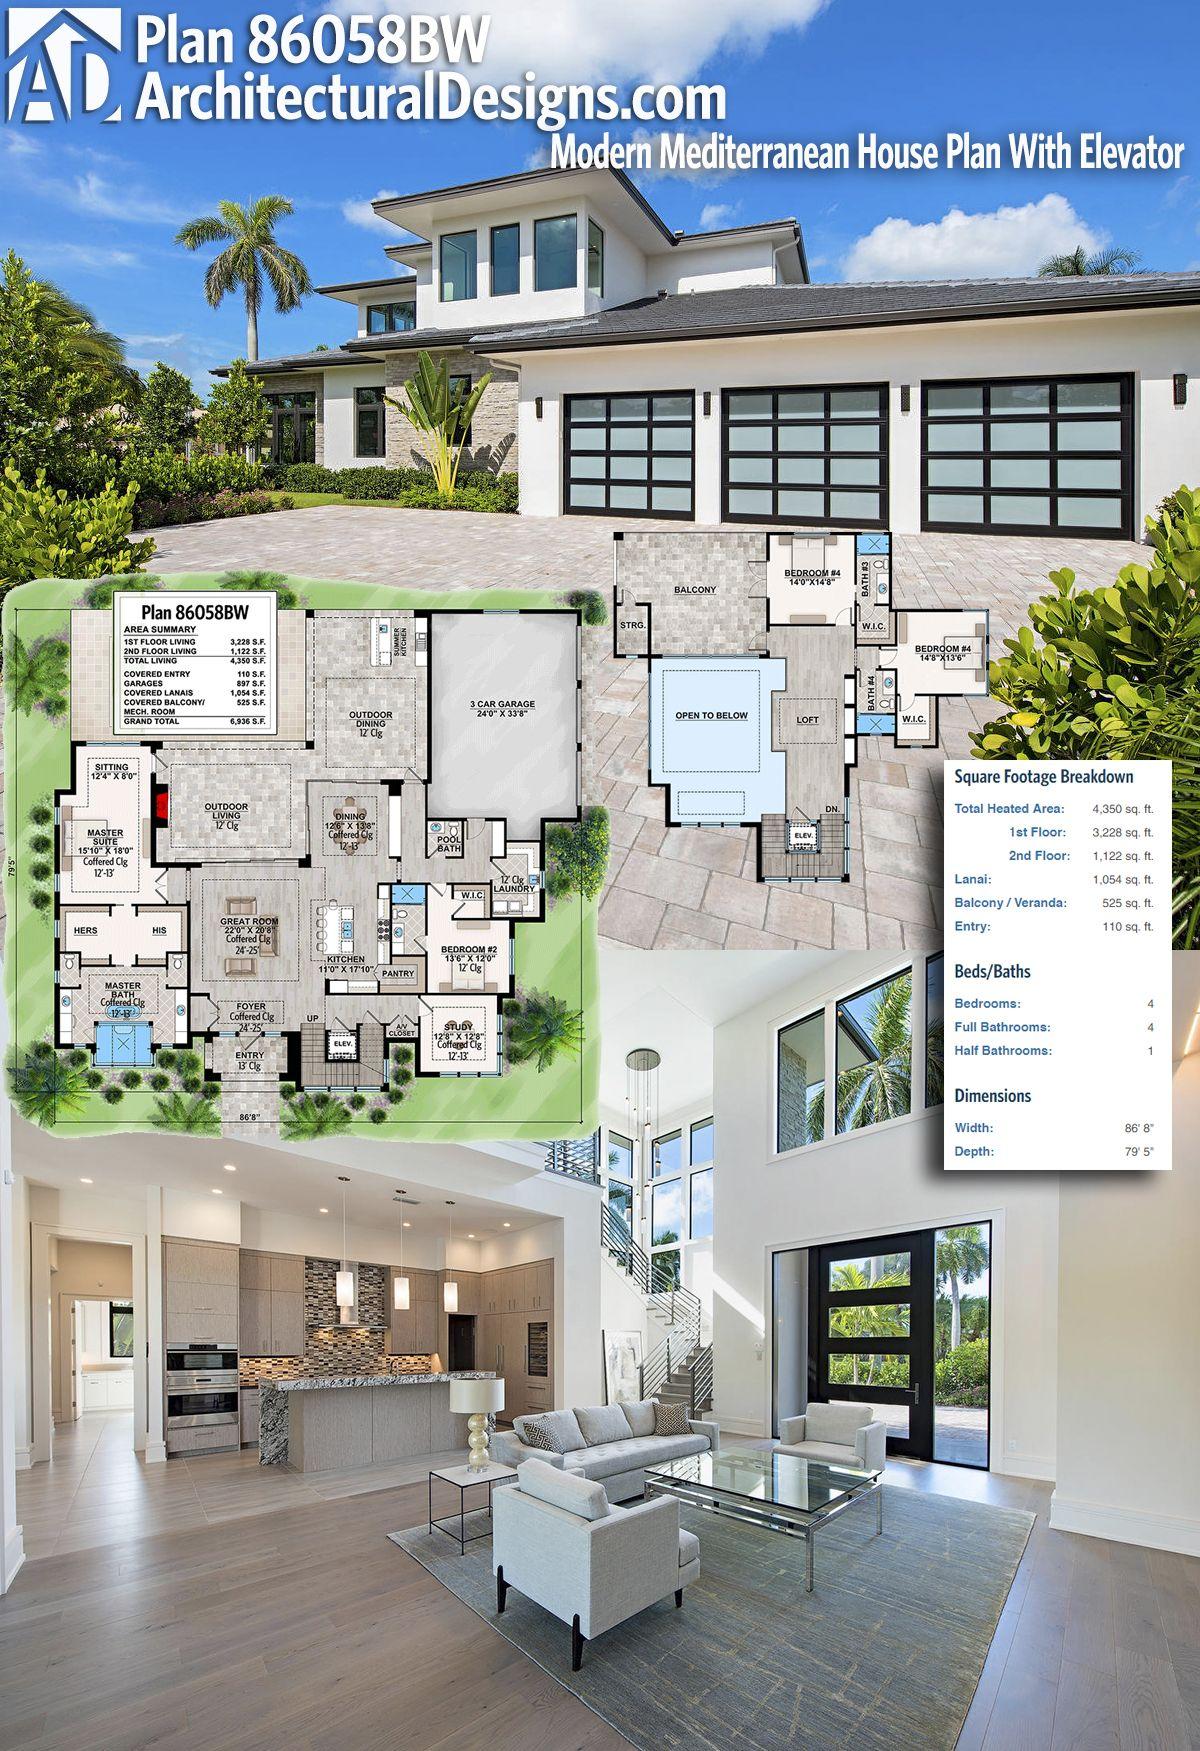 Plan 86058BW Modern Mediterranean House Plan